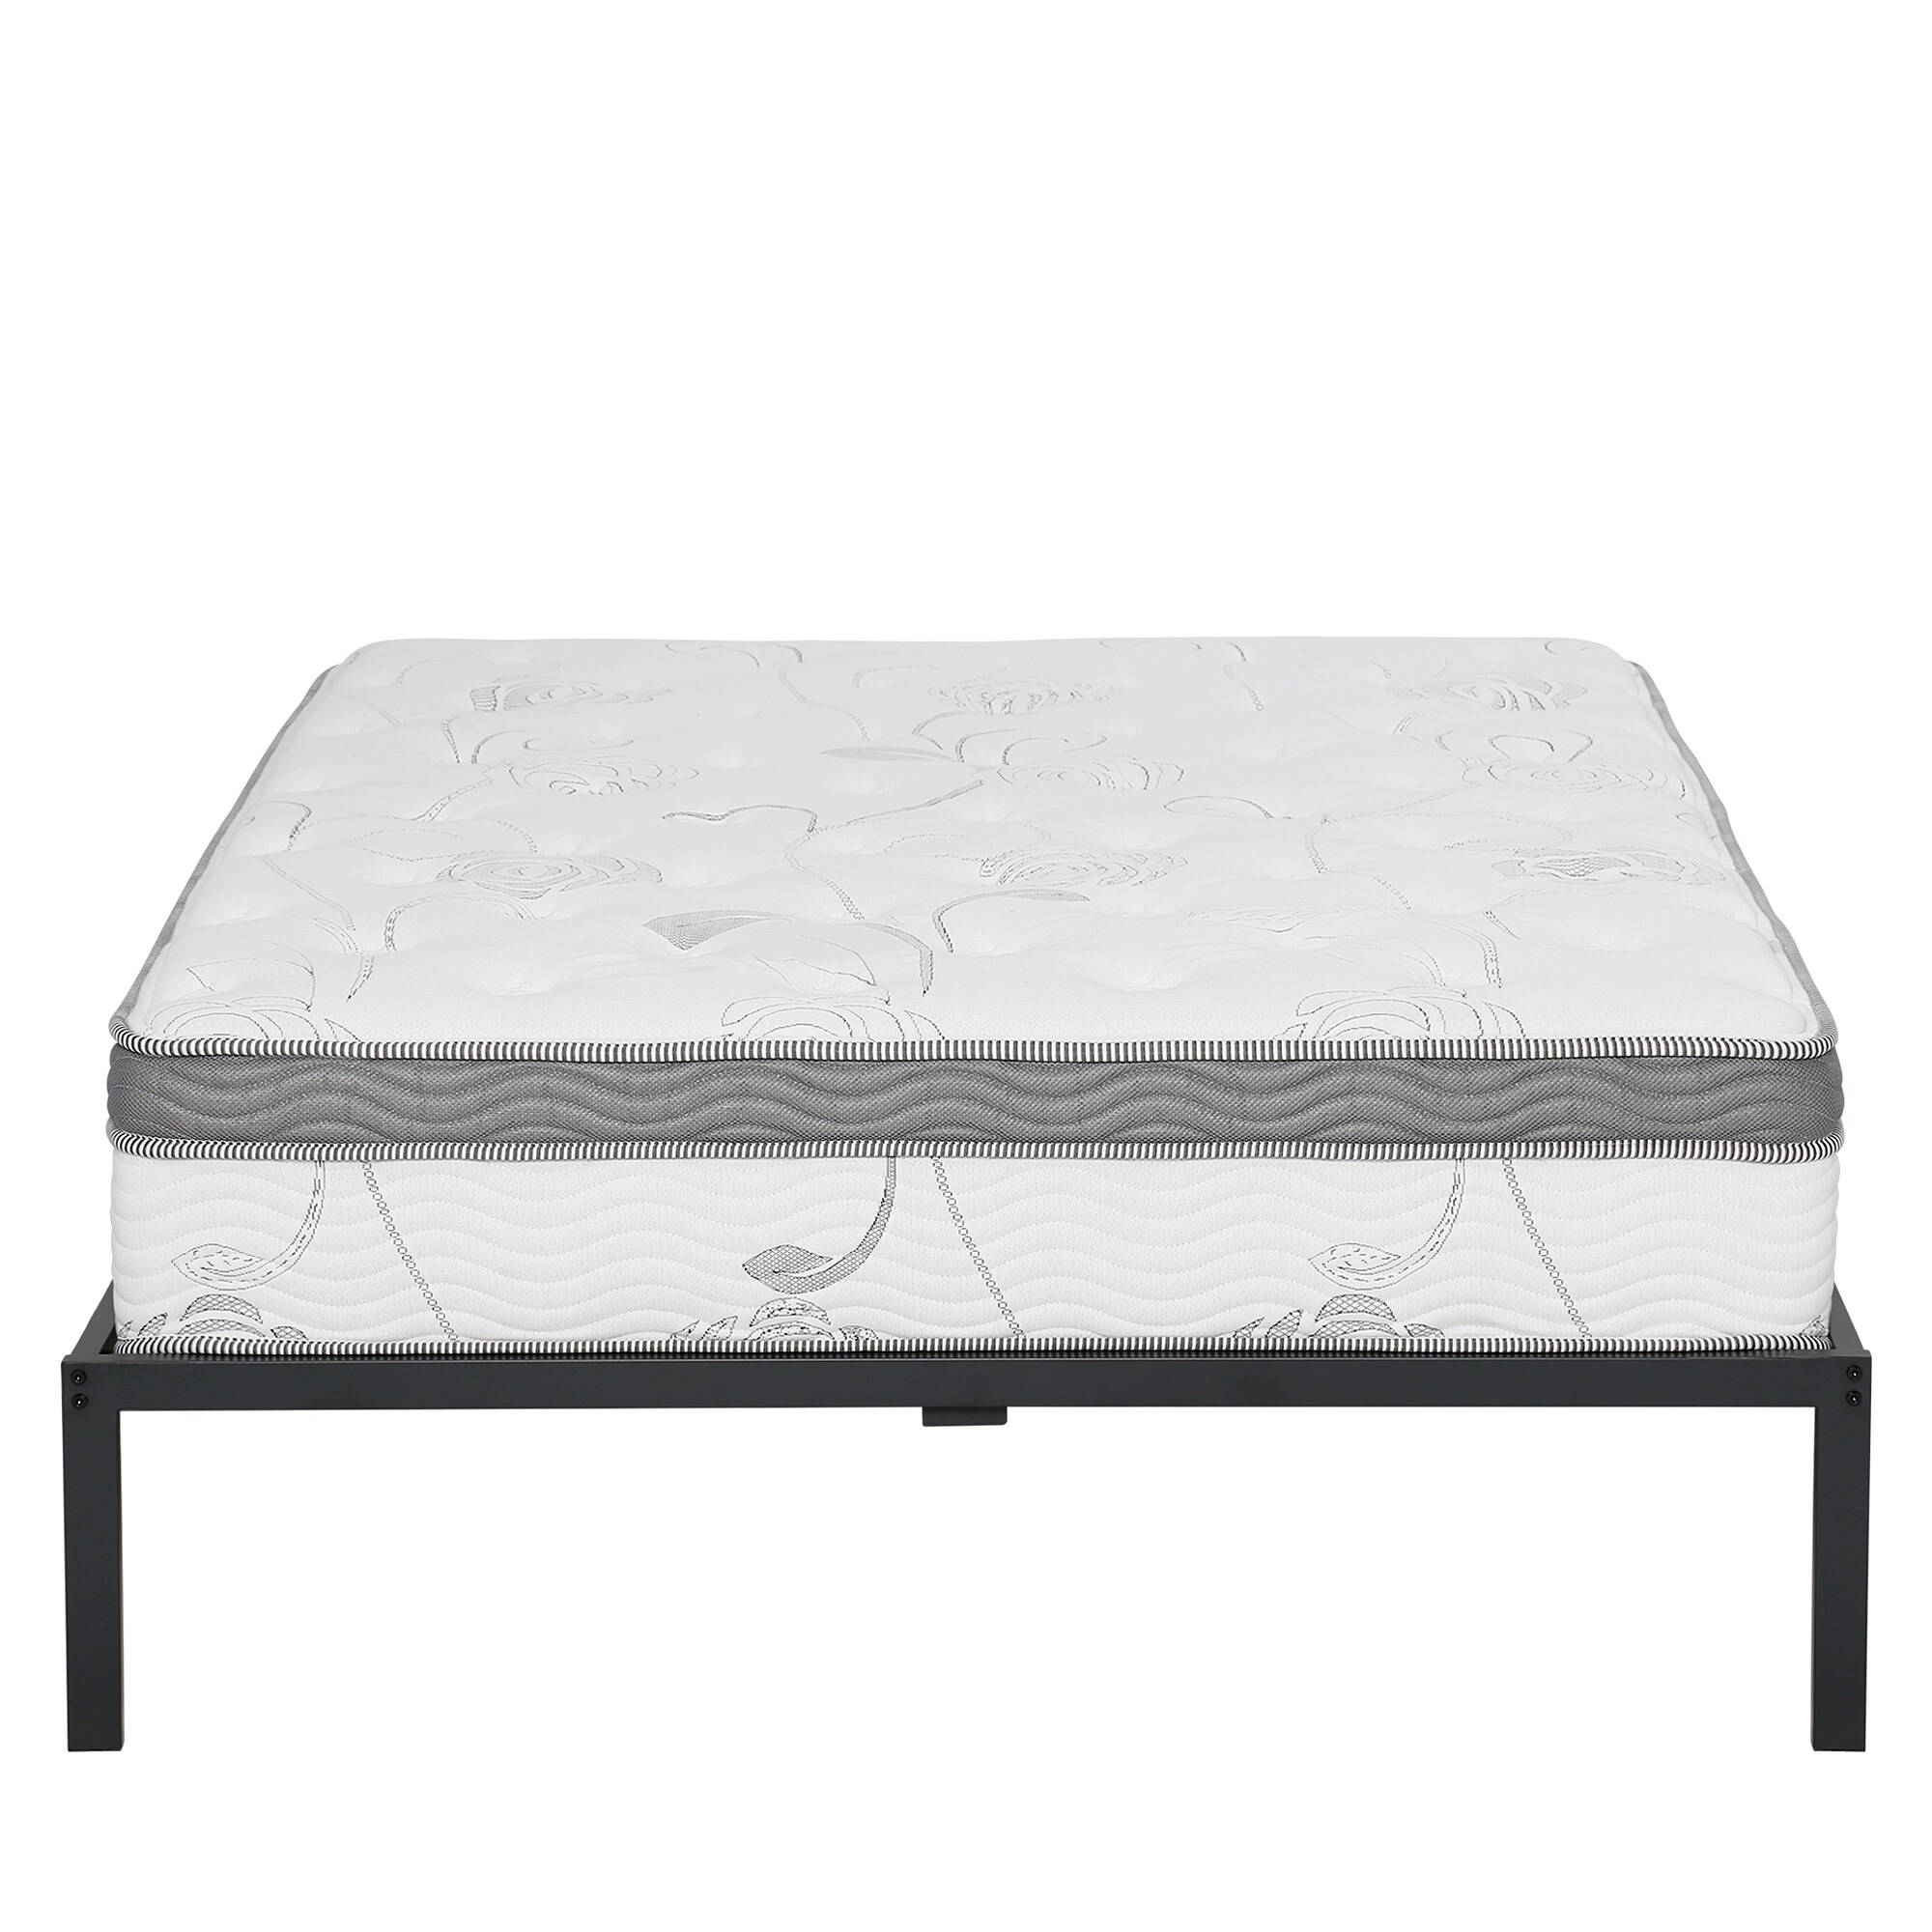 Shop Sleeplanner 14 Inch Platform Metal Bed Frame With Plastic Leg Mats Queen Size